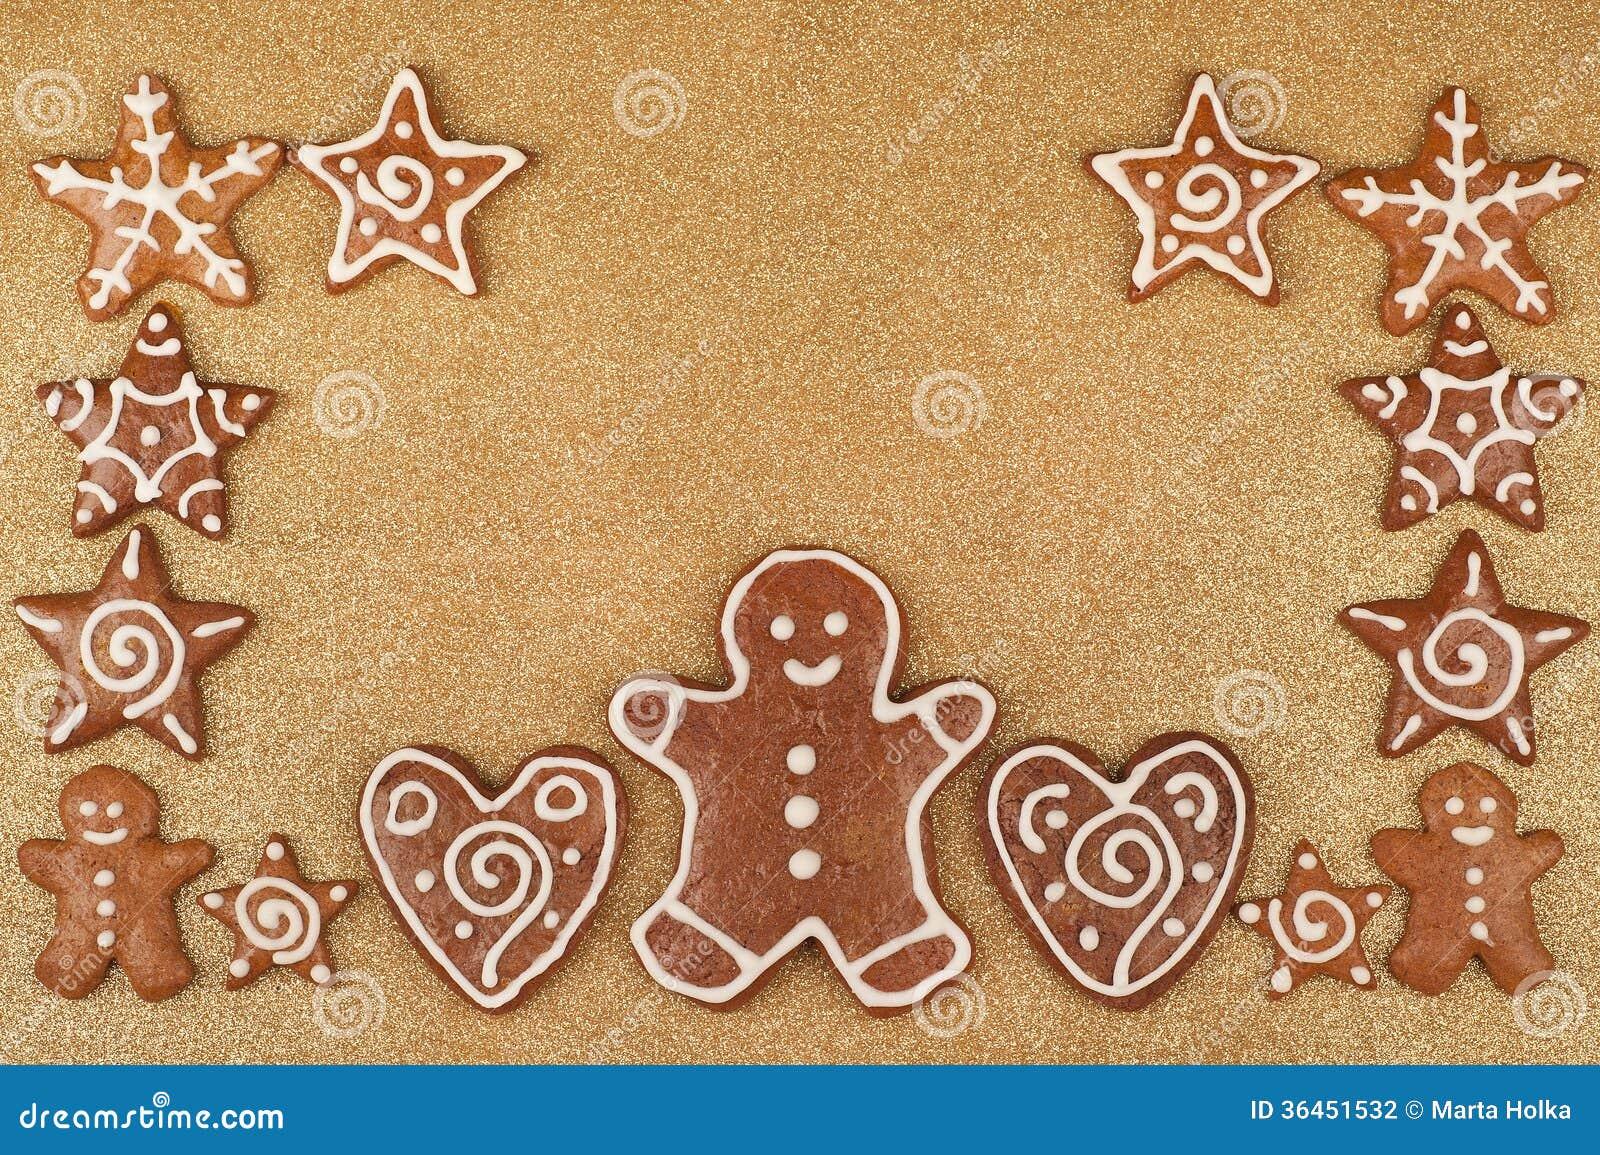 Homebaked Christmas Gingerbread Cookies border.